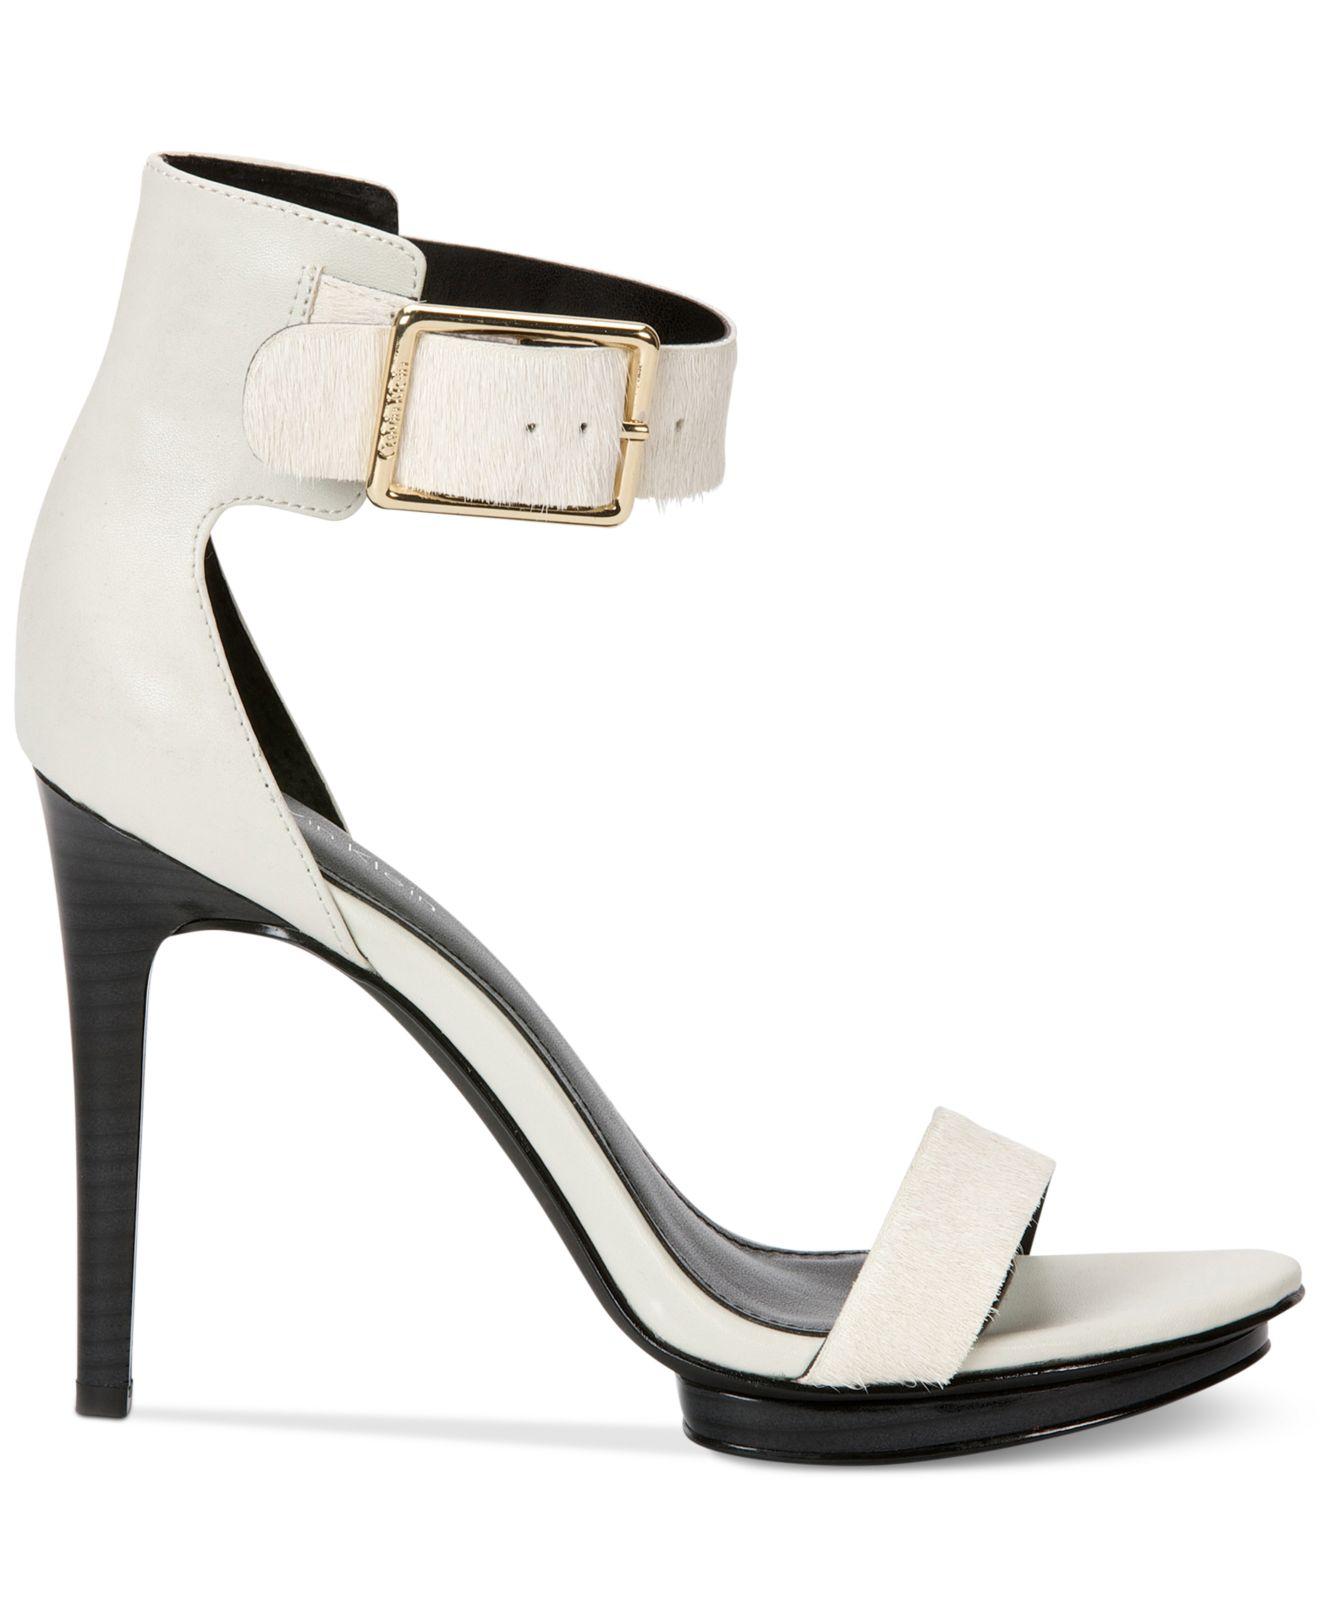 57ffffe29d18 Lyst - Calvin Klein Women S Vivian High Heel Sandals in White